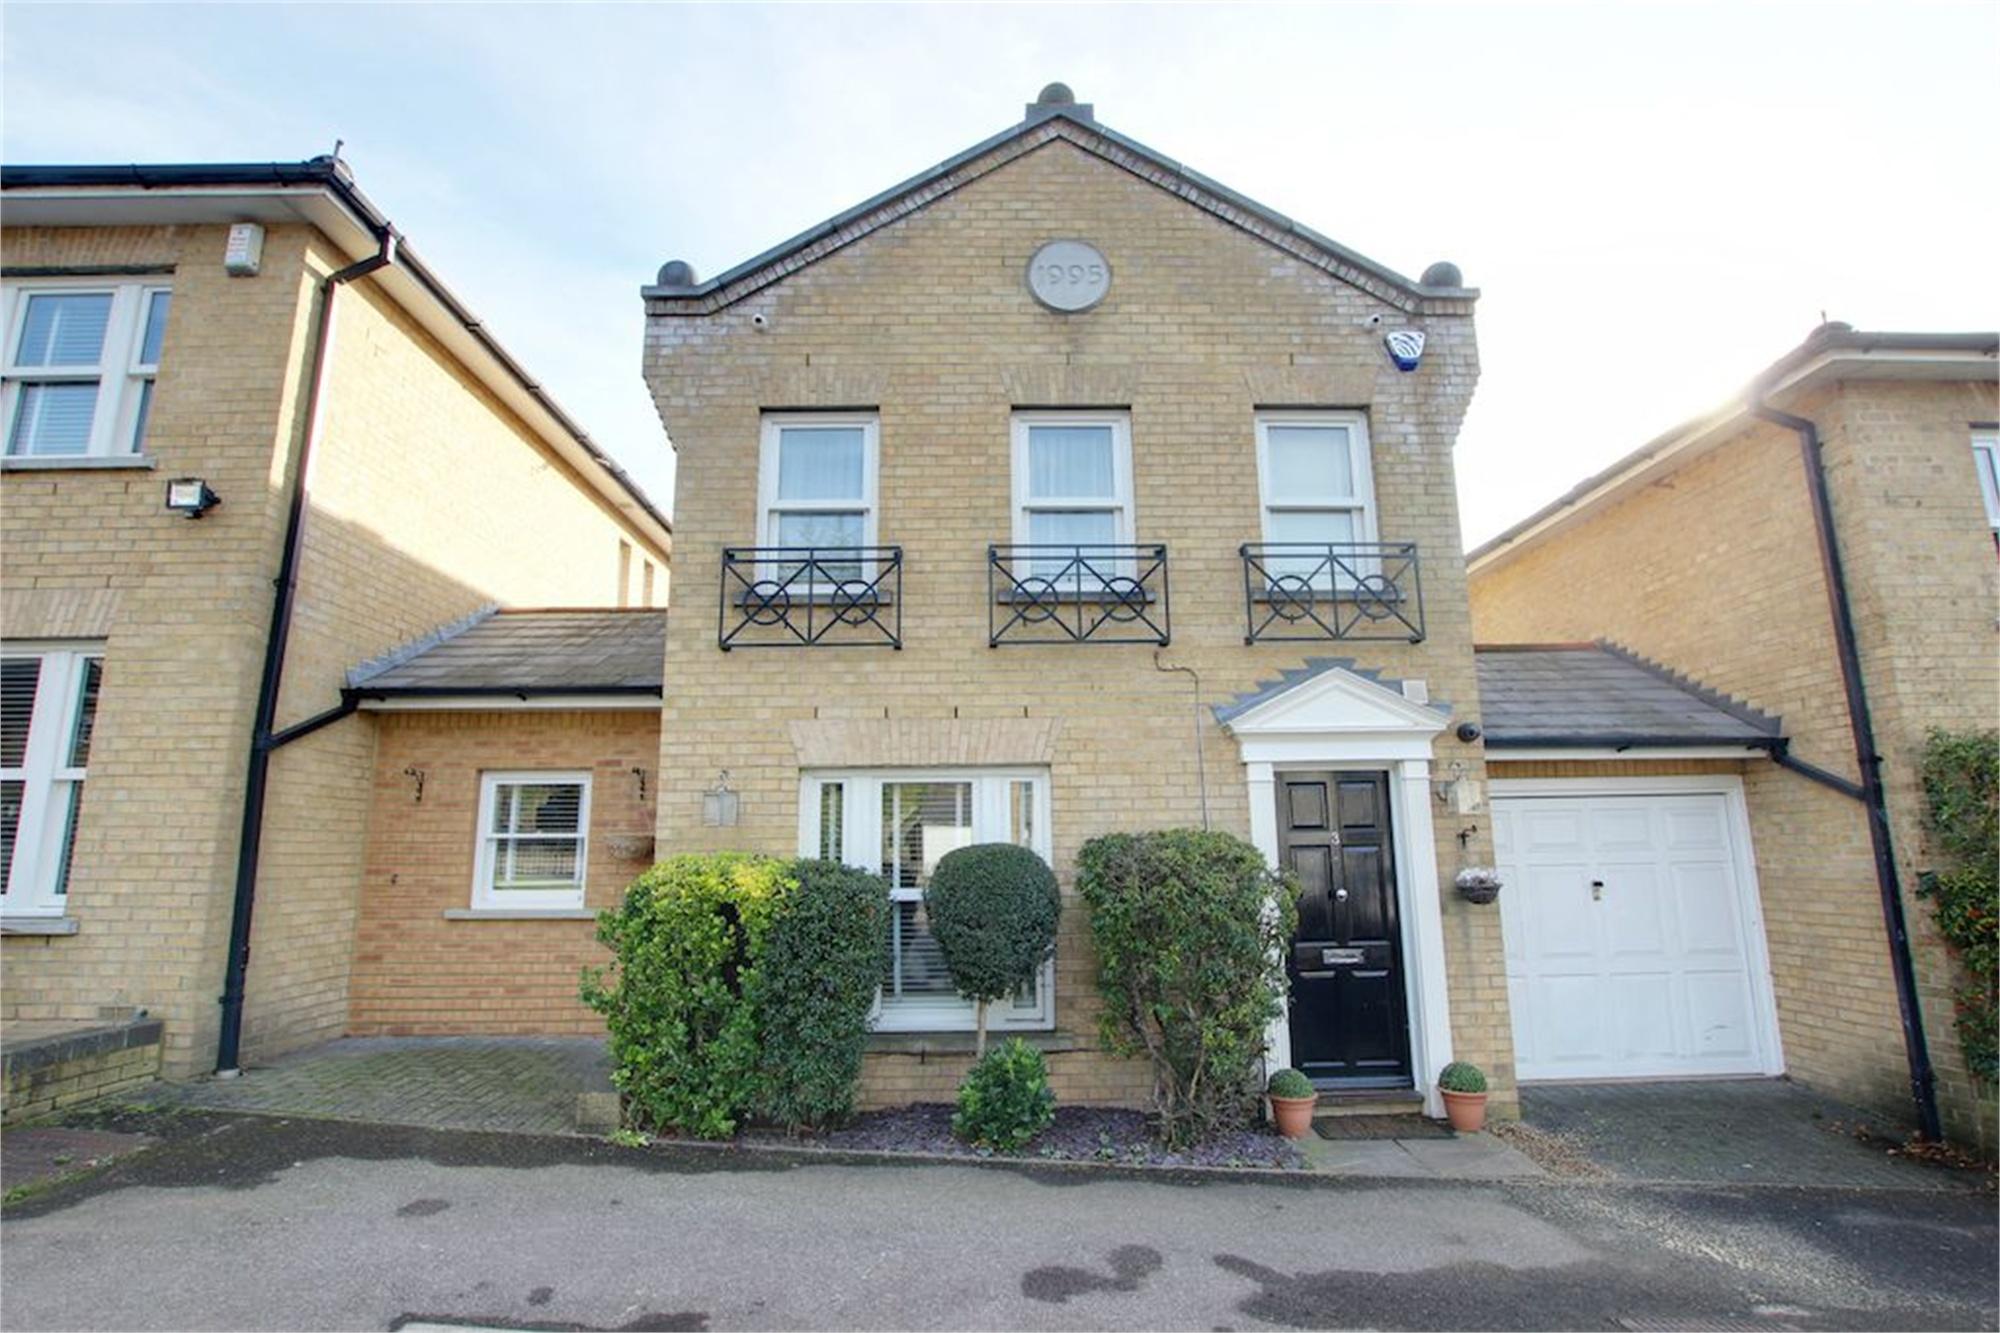 Brancaster Place, Church Hill, Loughton, Essex